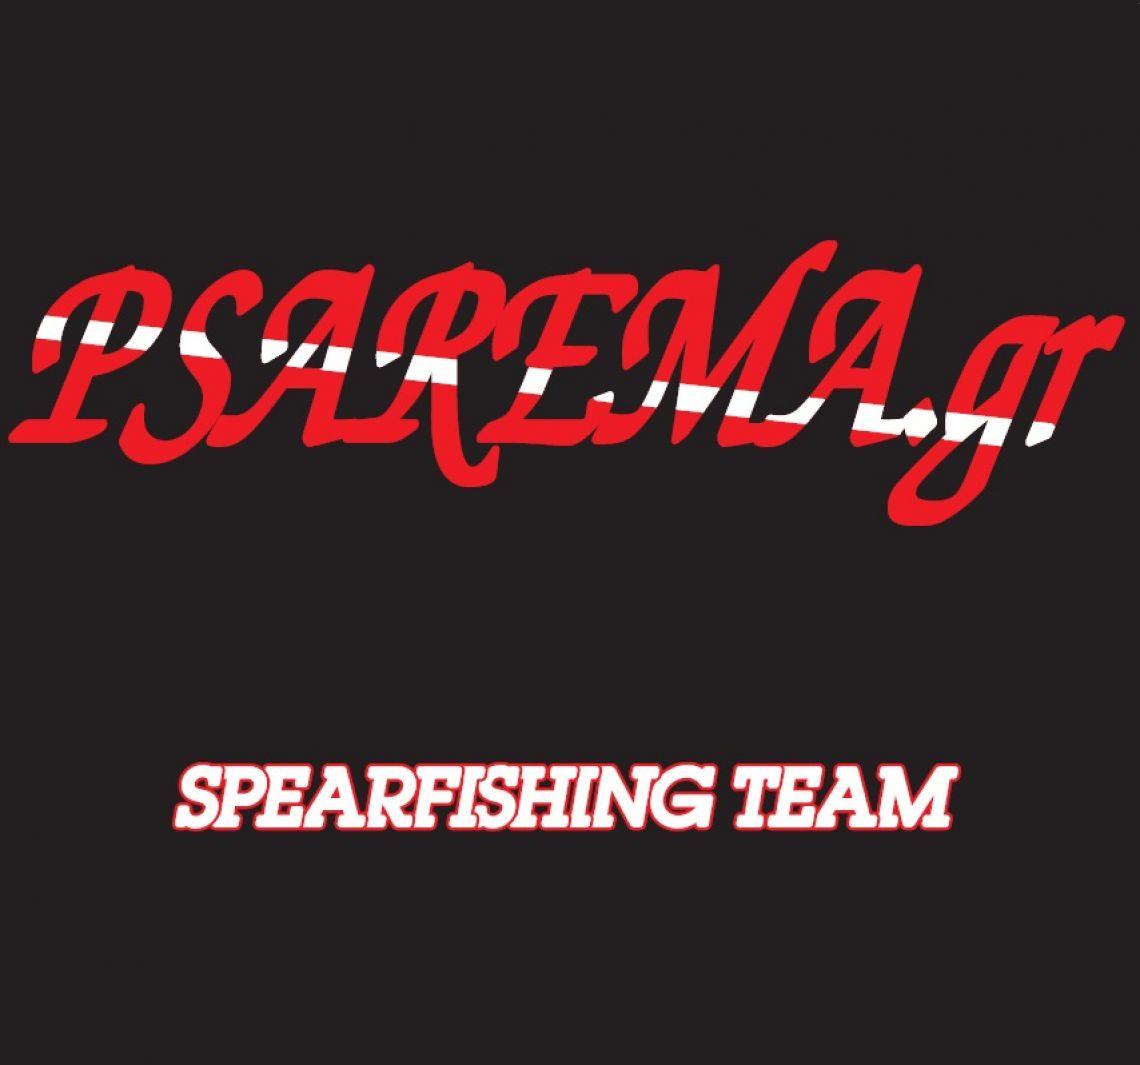 Spearfising Team